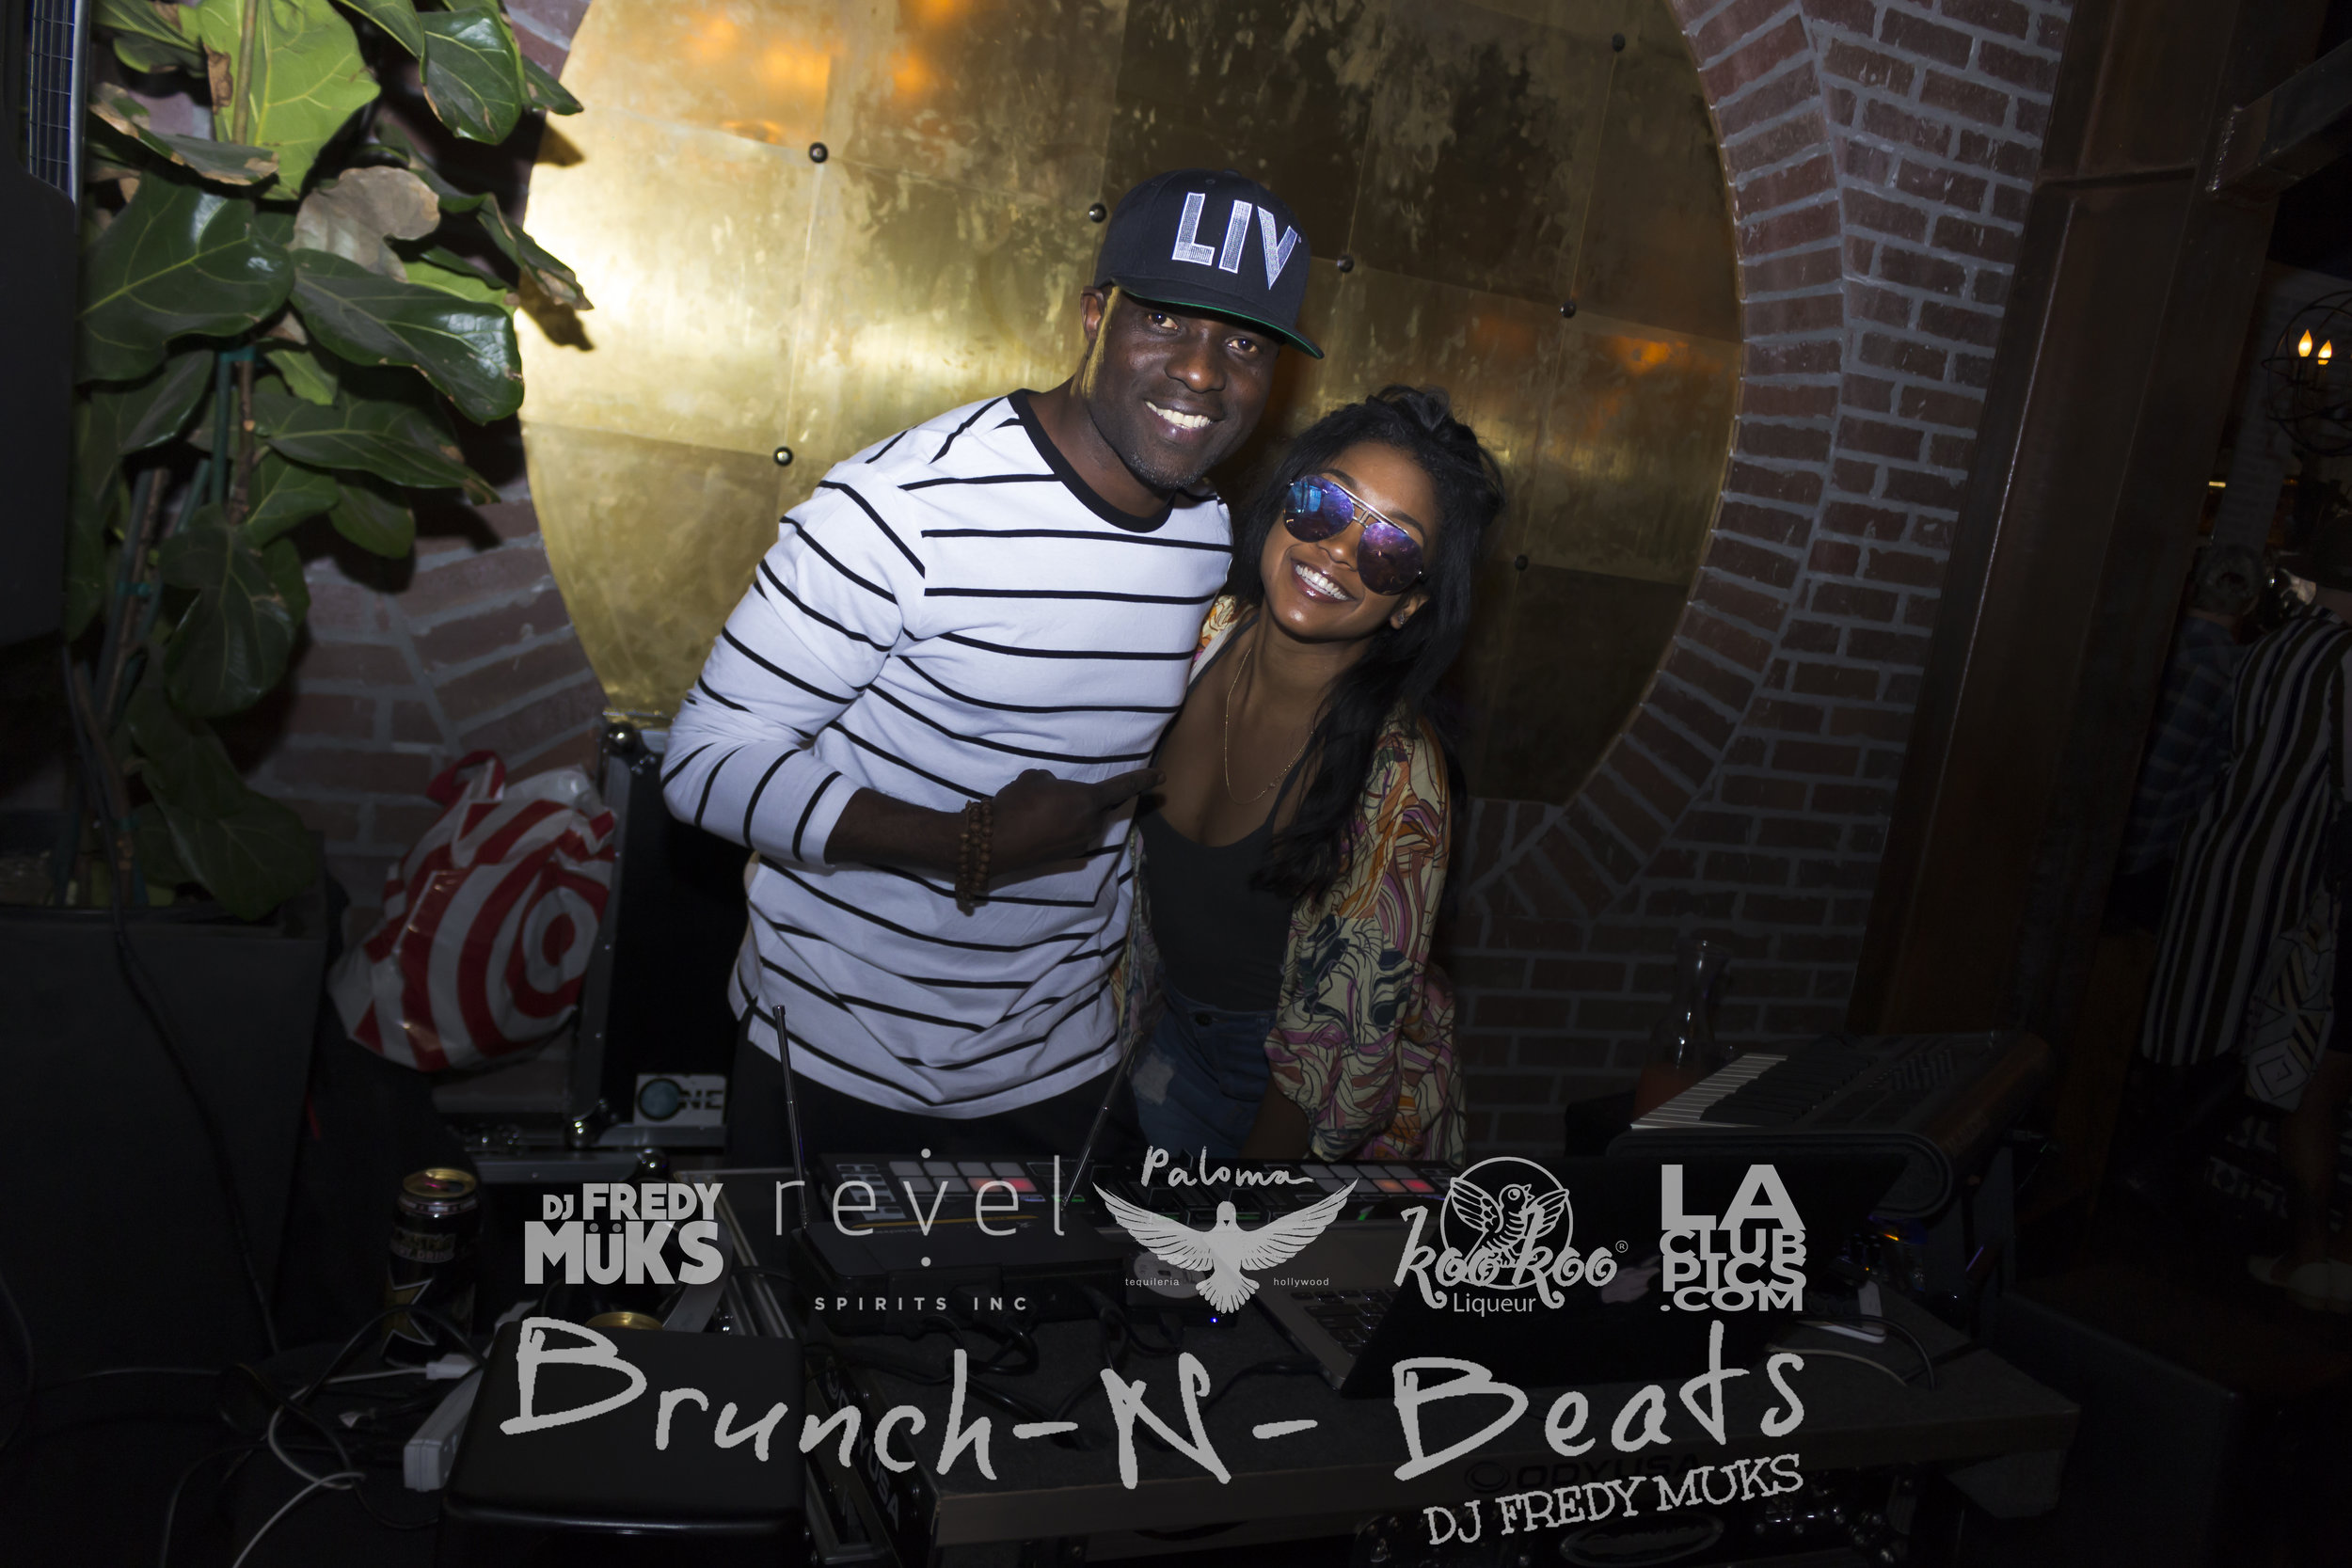 Brunch-N-Beats - Paloma Hollywood - 02-25-18_146.jpg